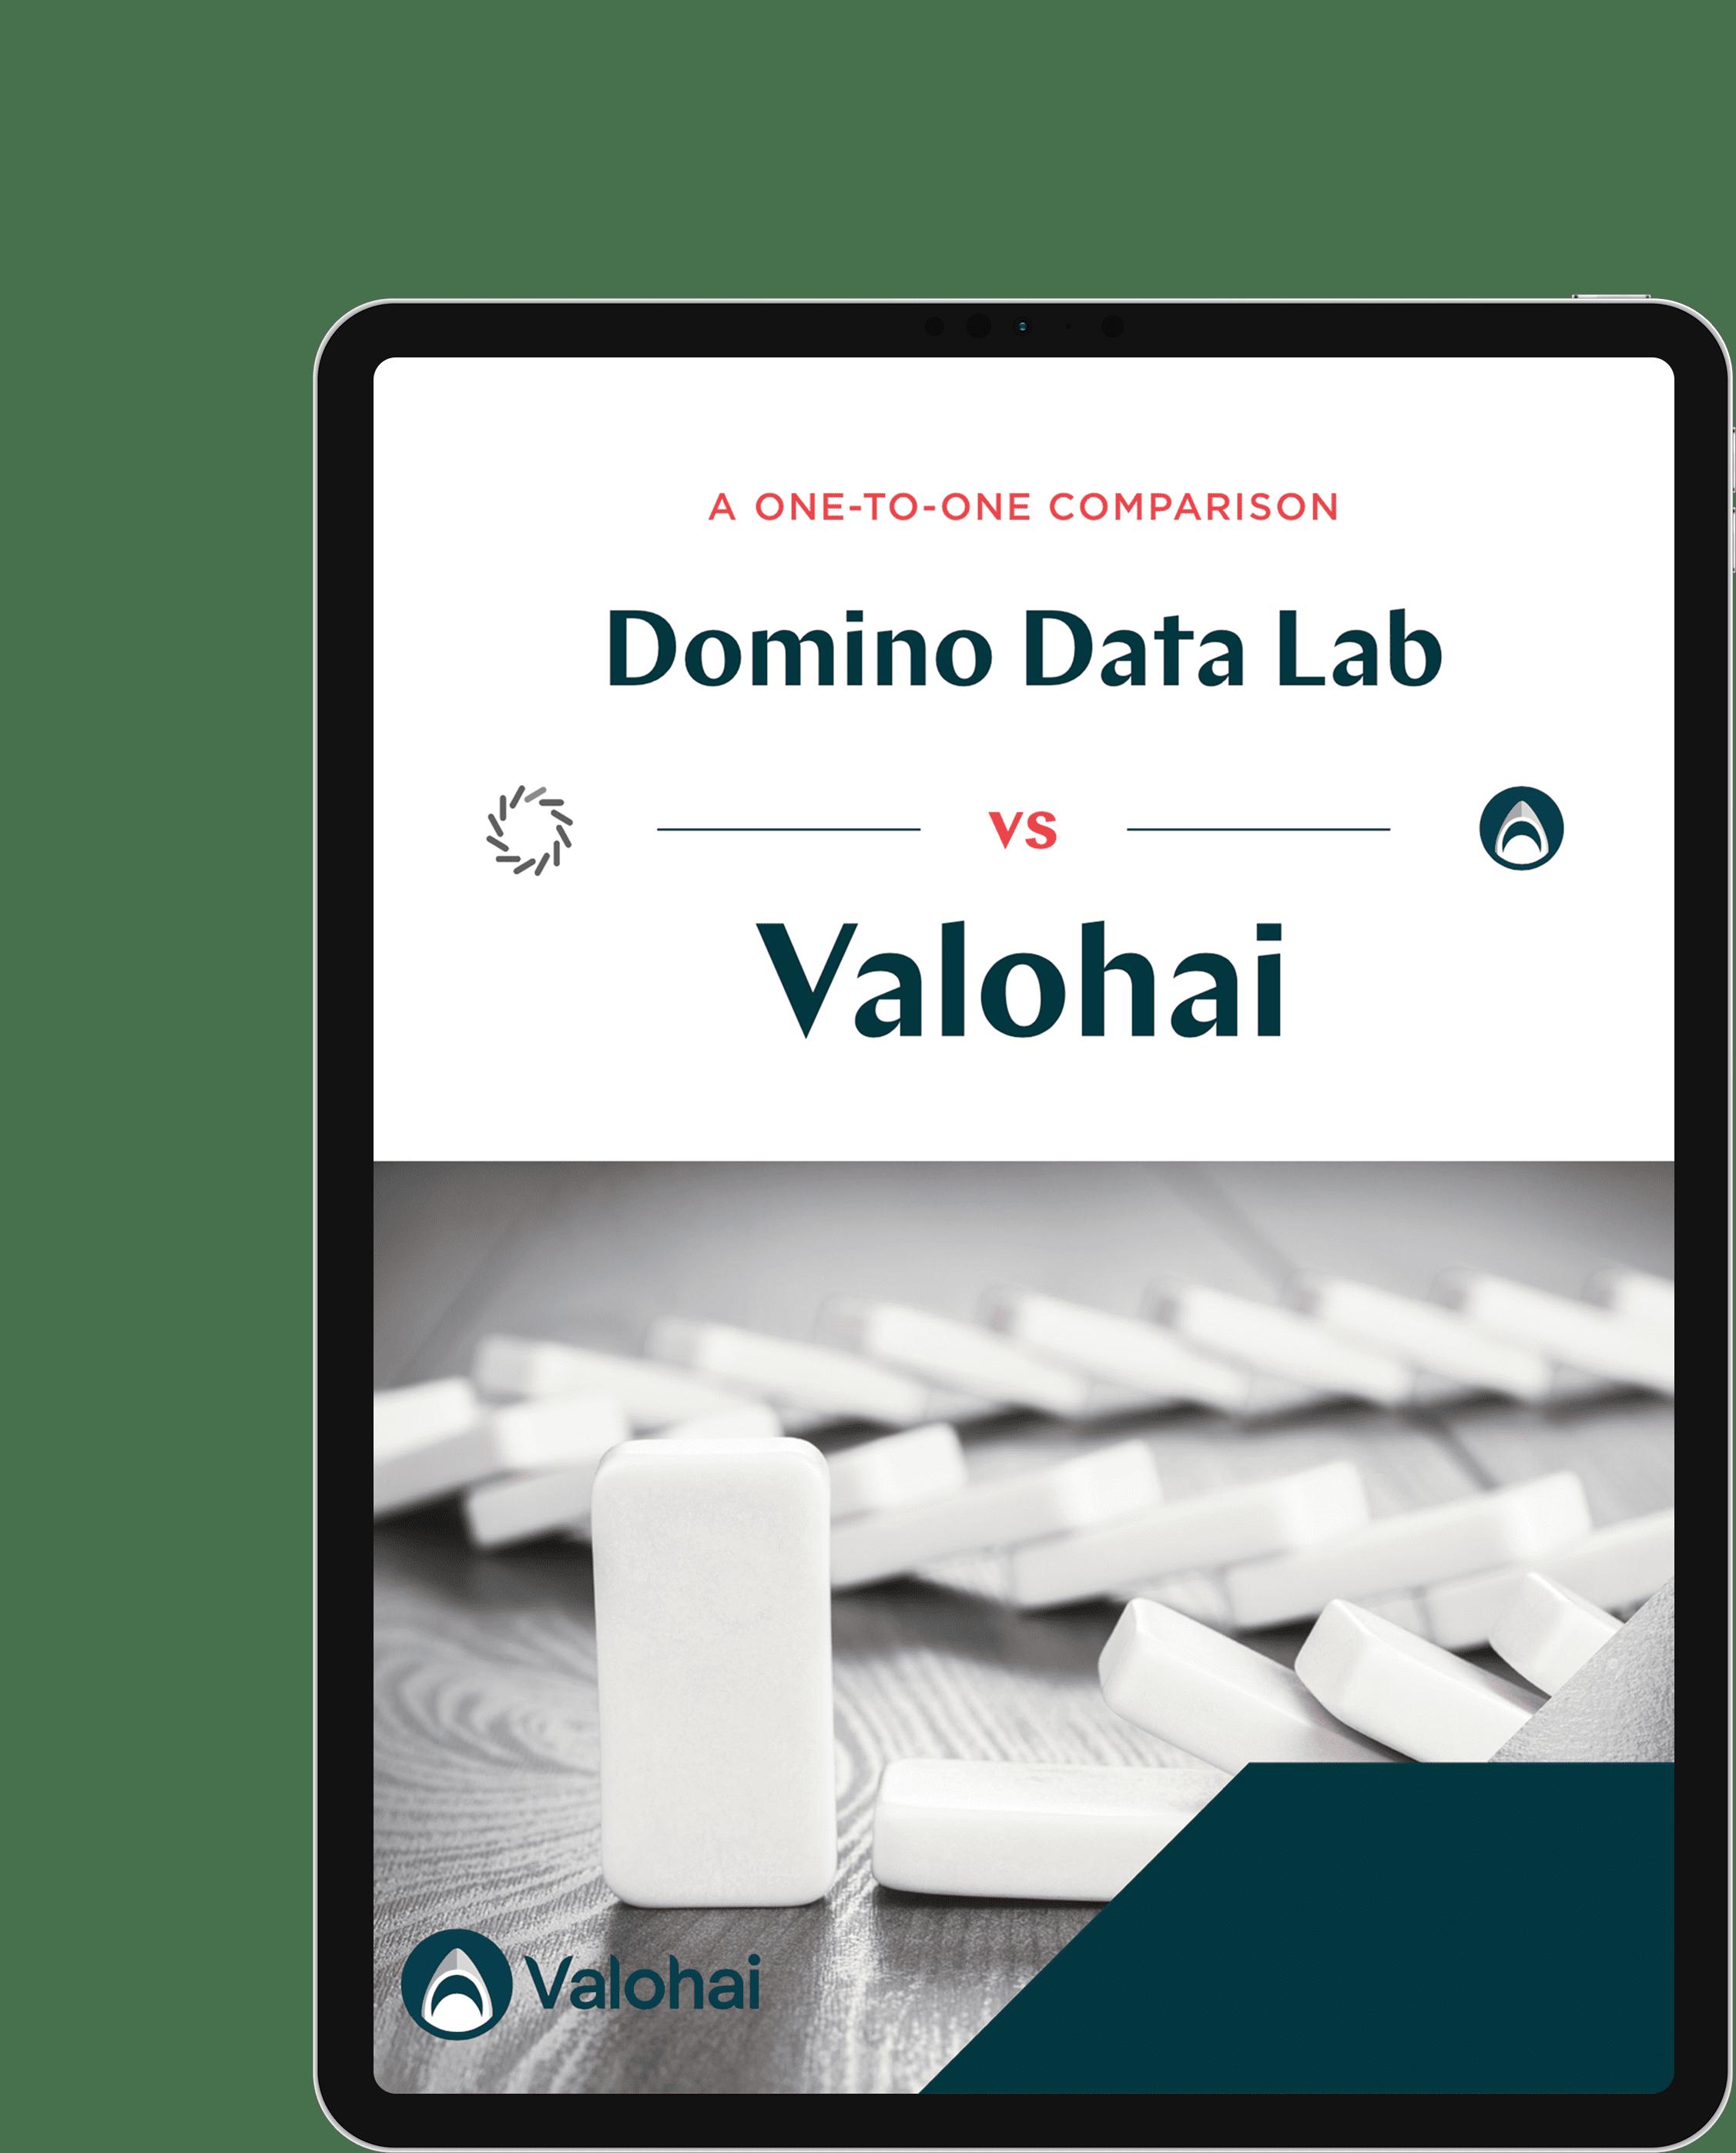 valohai-databricks-ipad-1